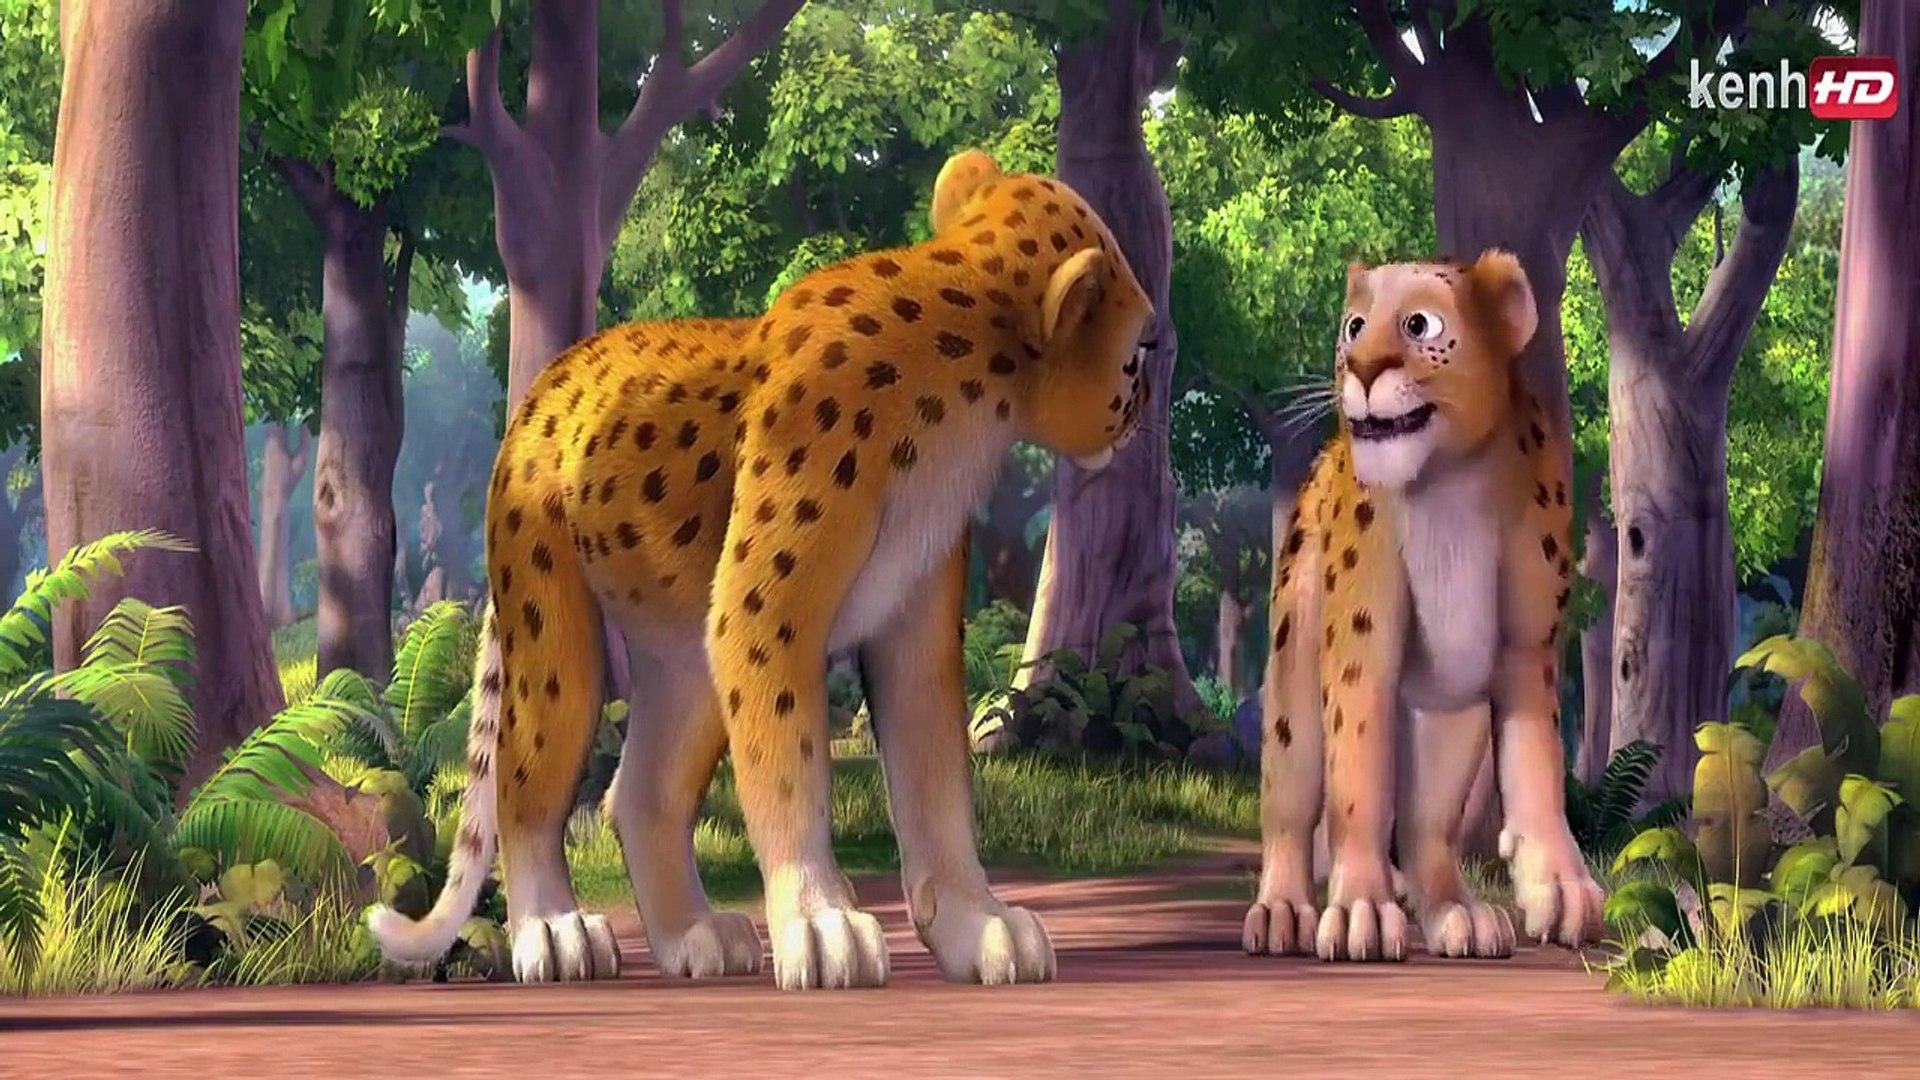 Animated Cheetah Wallpaper disney movies for kids ☆ movies for kids ☆ animation movies for children